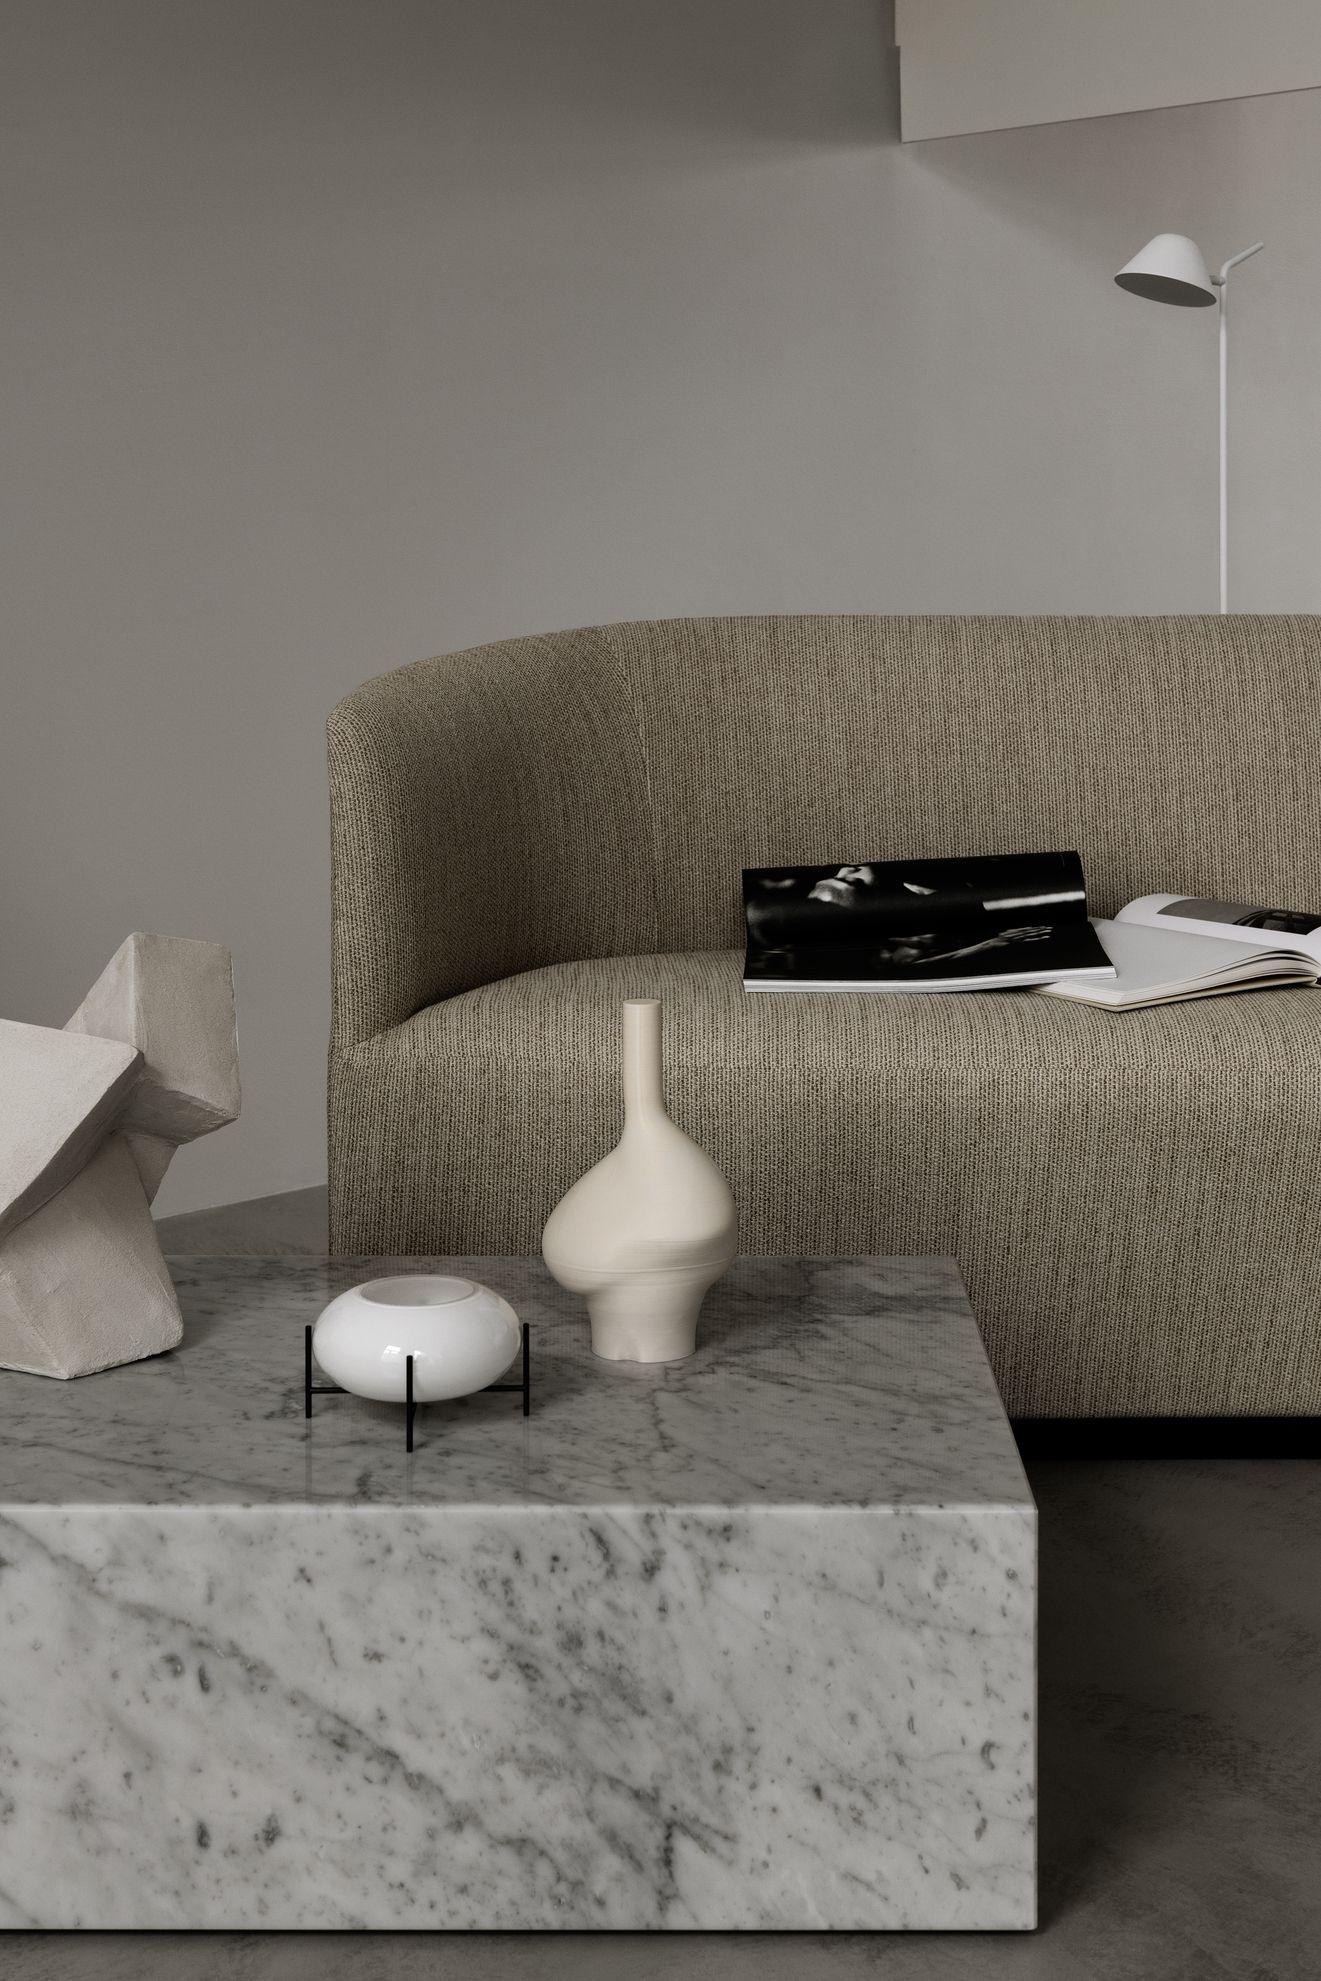 Menu A Stylish Minimalist Living Room Setting In Beige Concrete